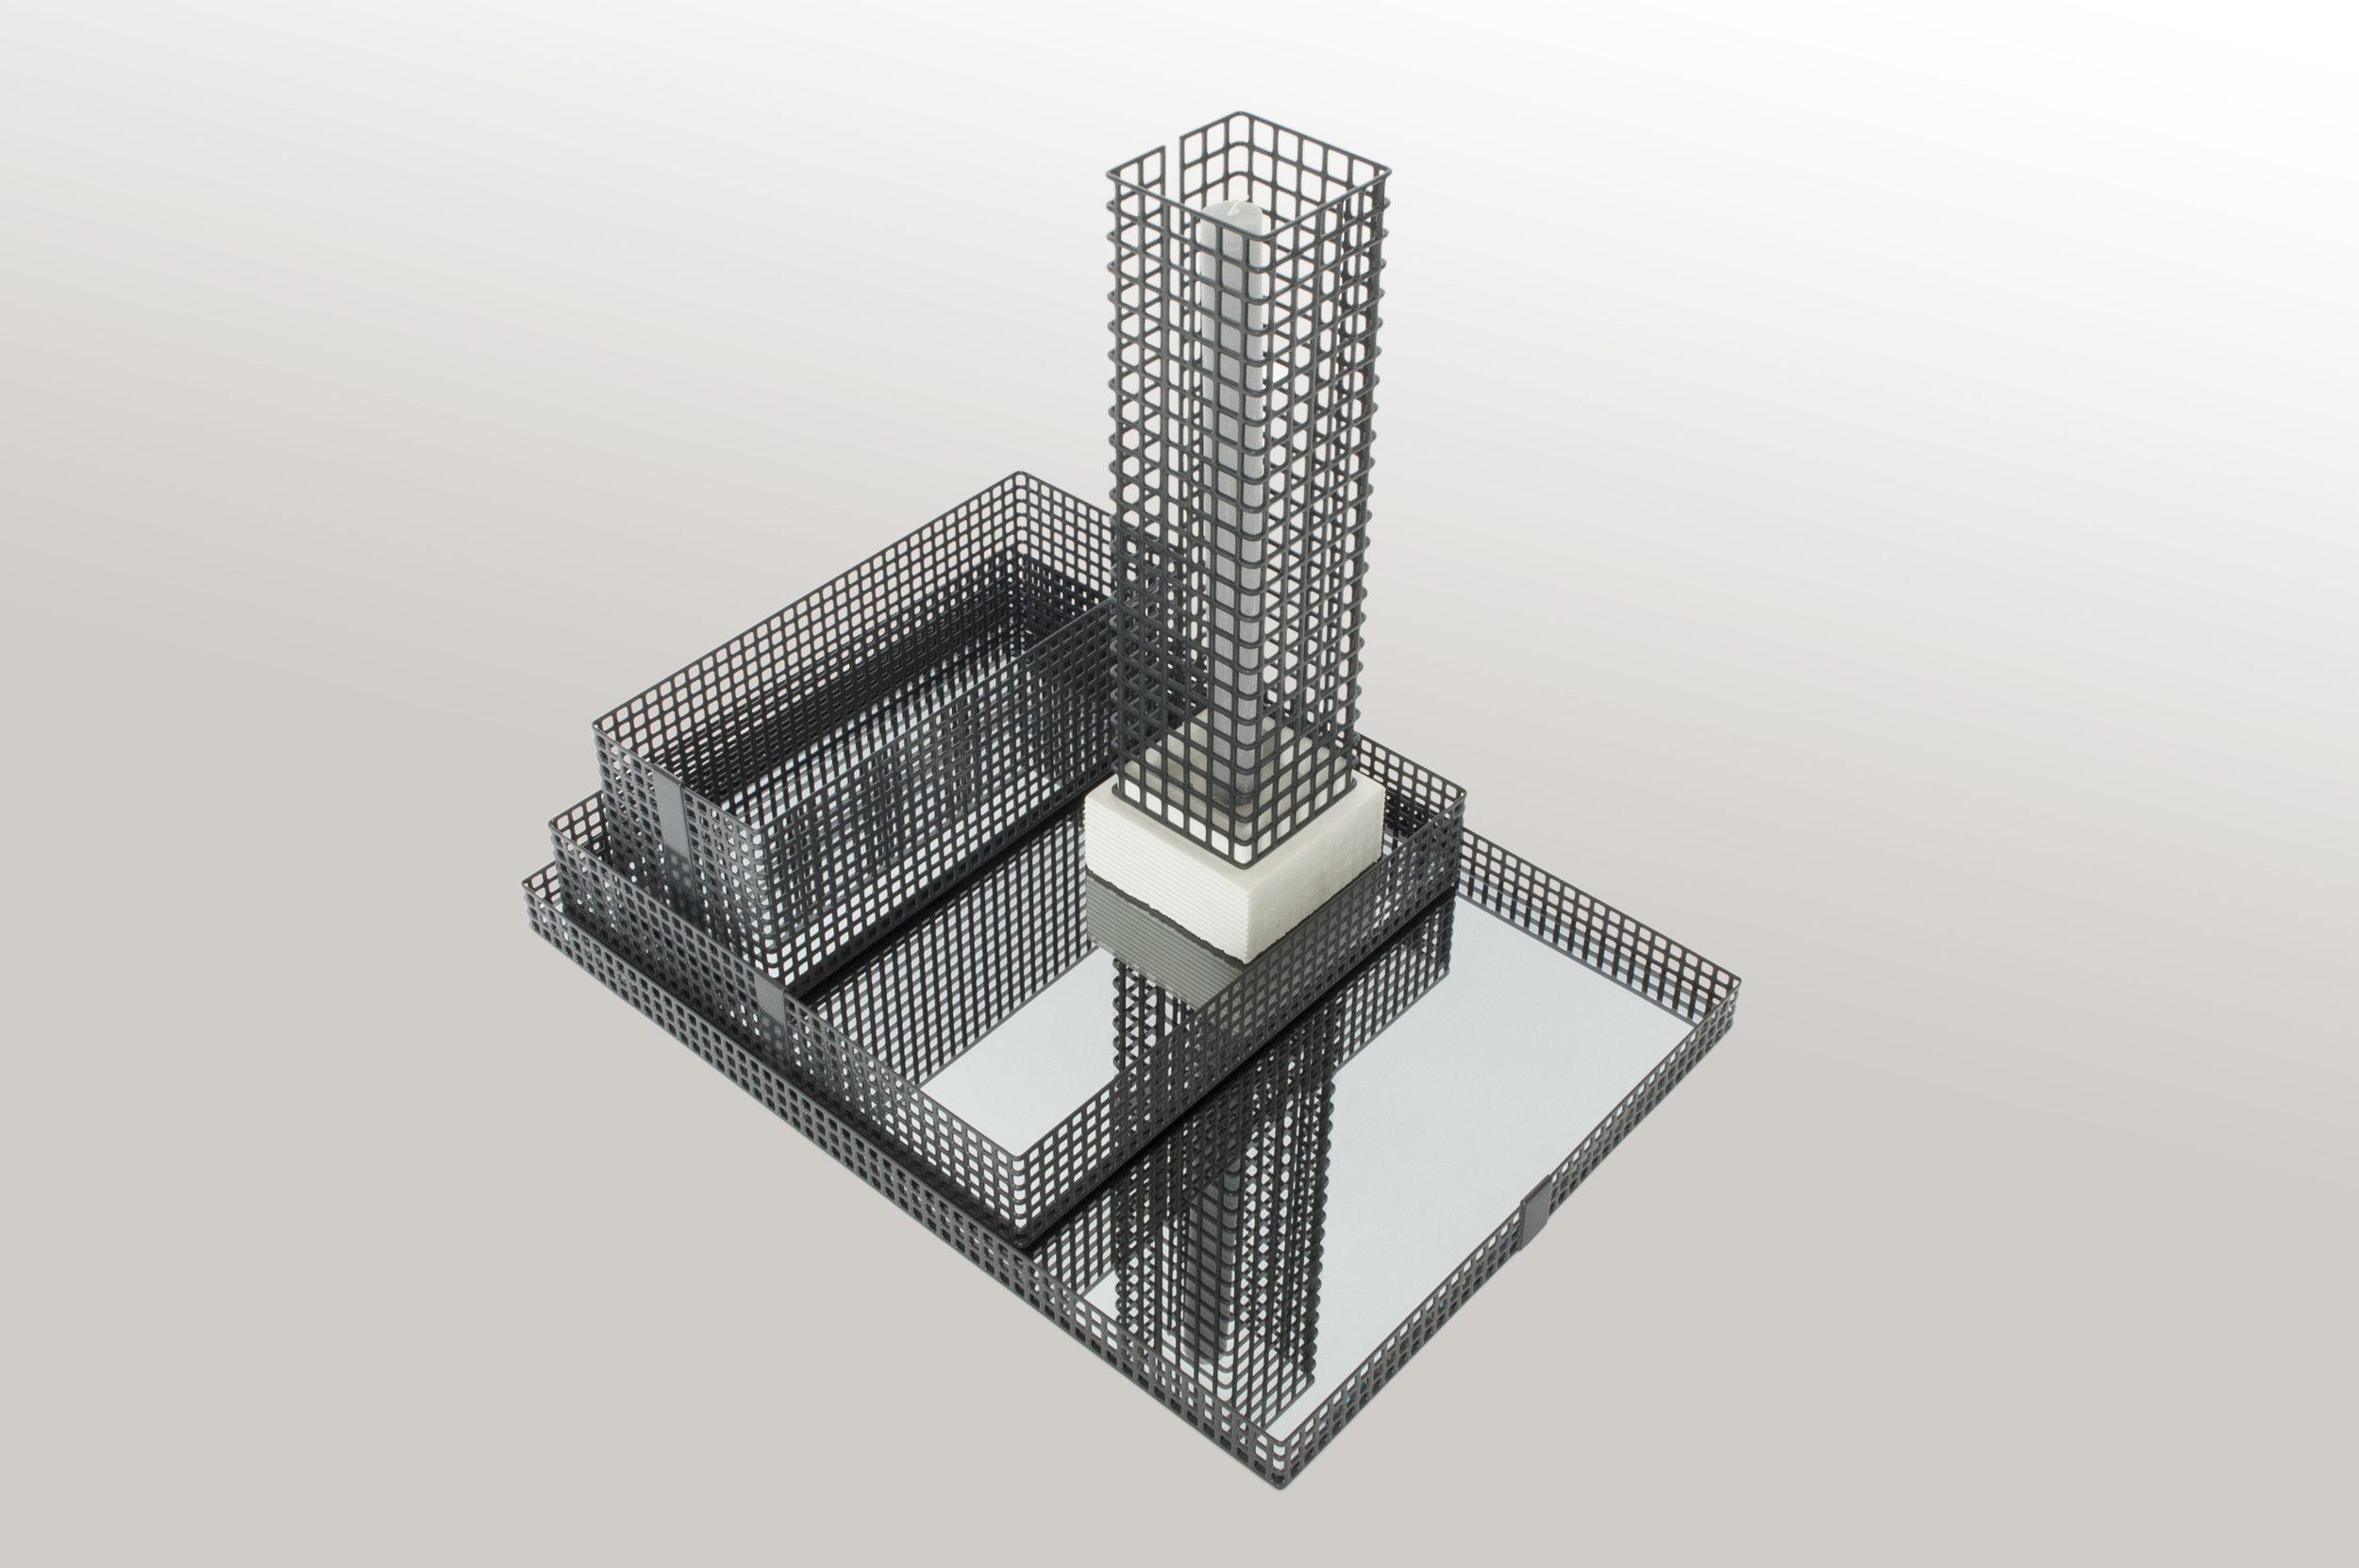 Table Architecture composition black - David Derksen Design.jpg